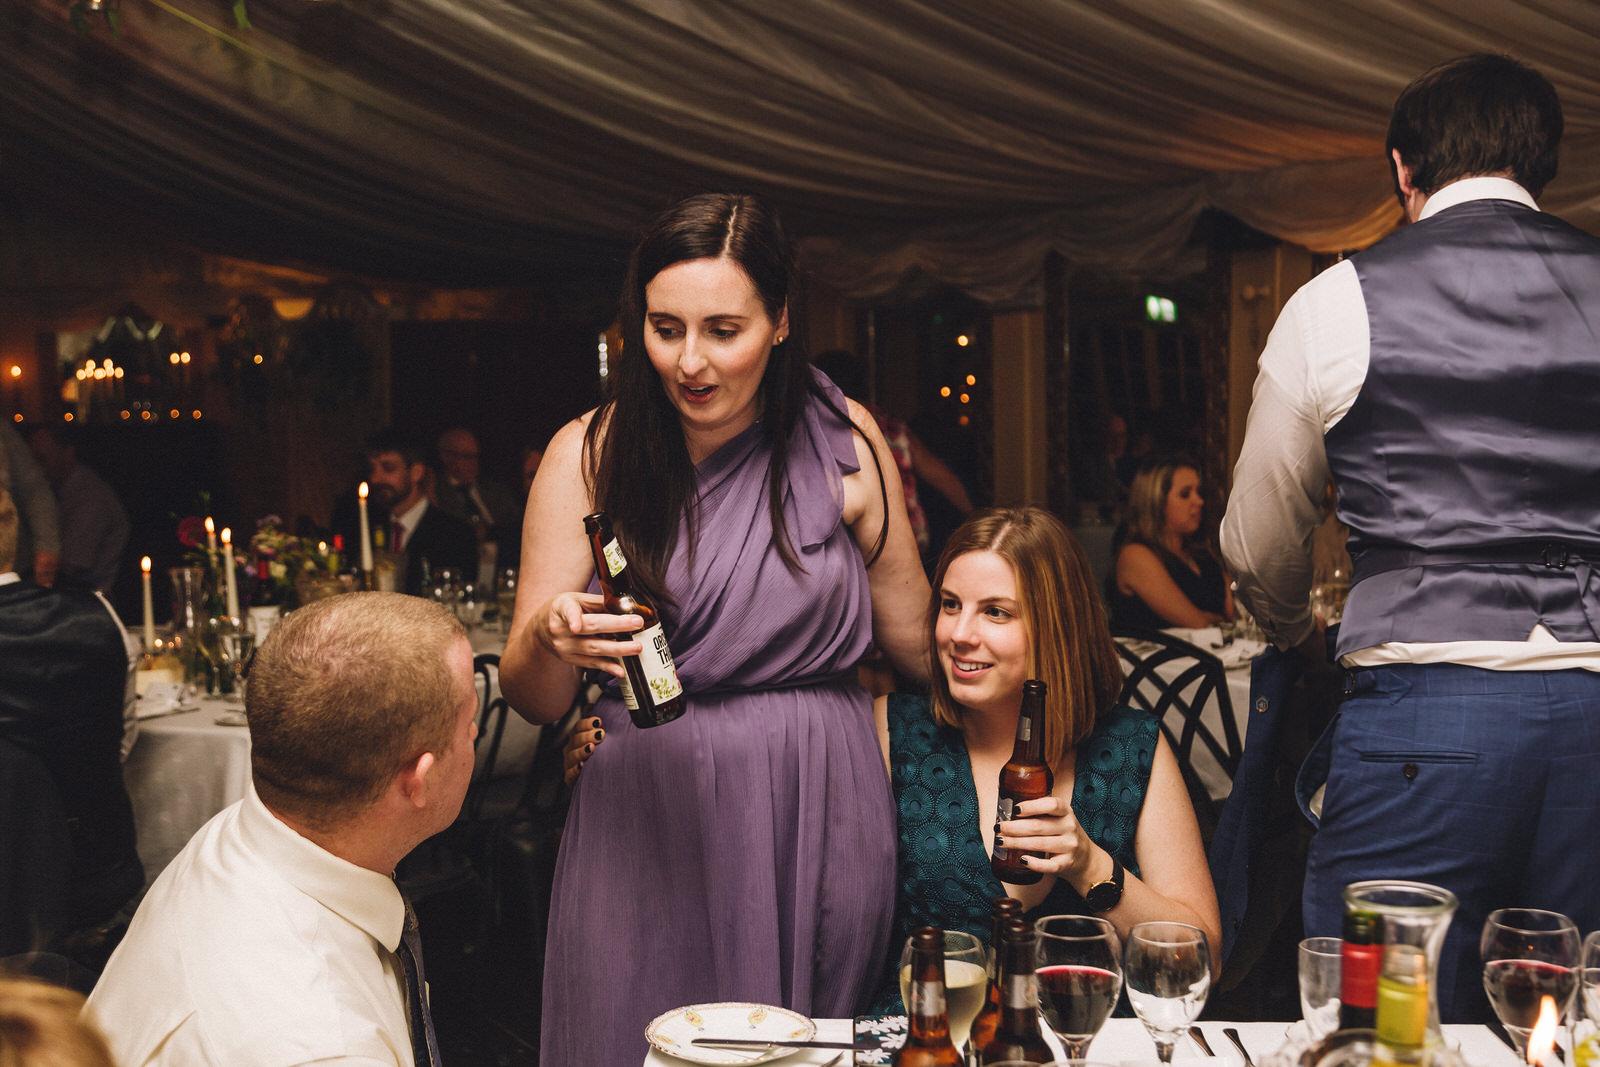 Balybeg-house-ireland-wicklow-wedding-photographer-roger-kenny_greystones122.jpg